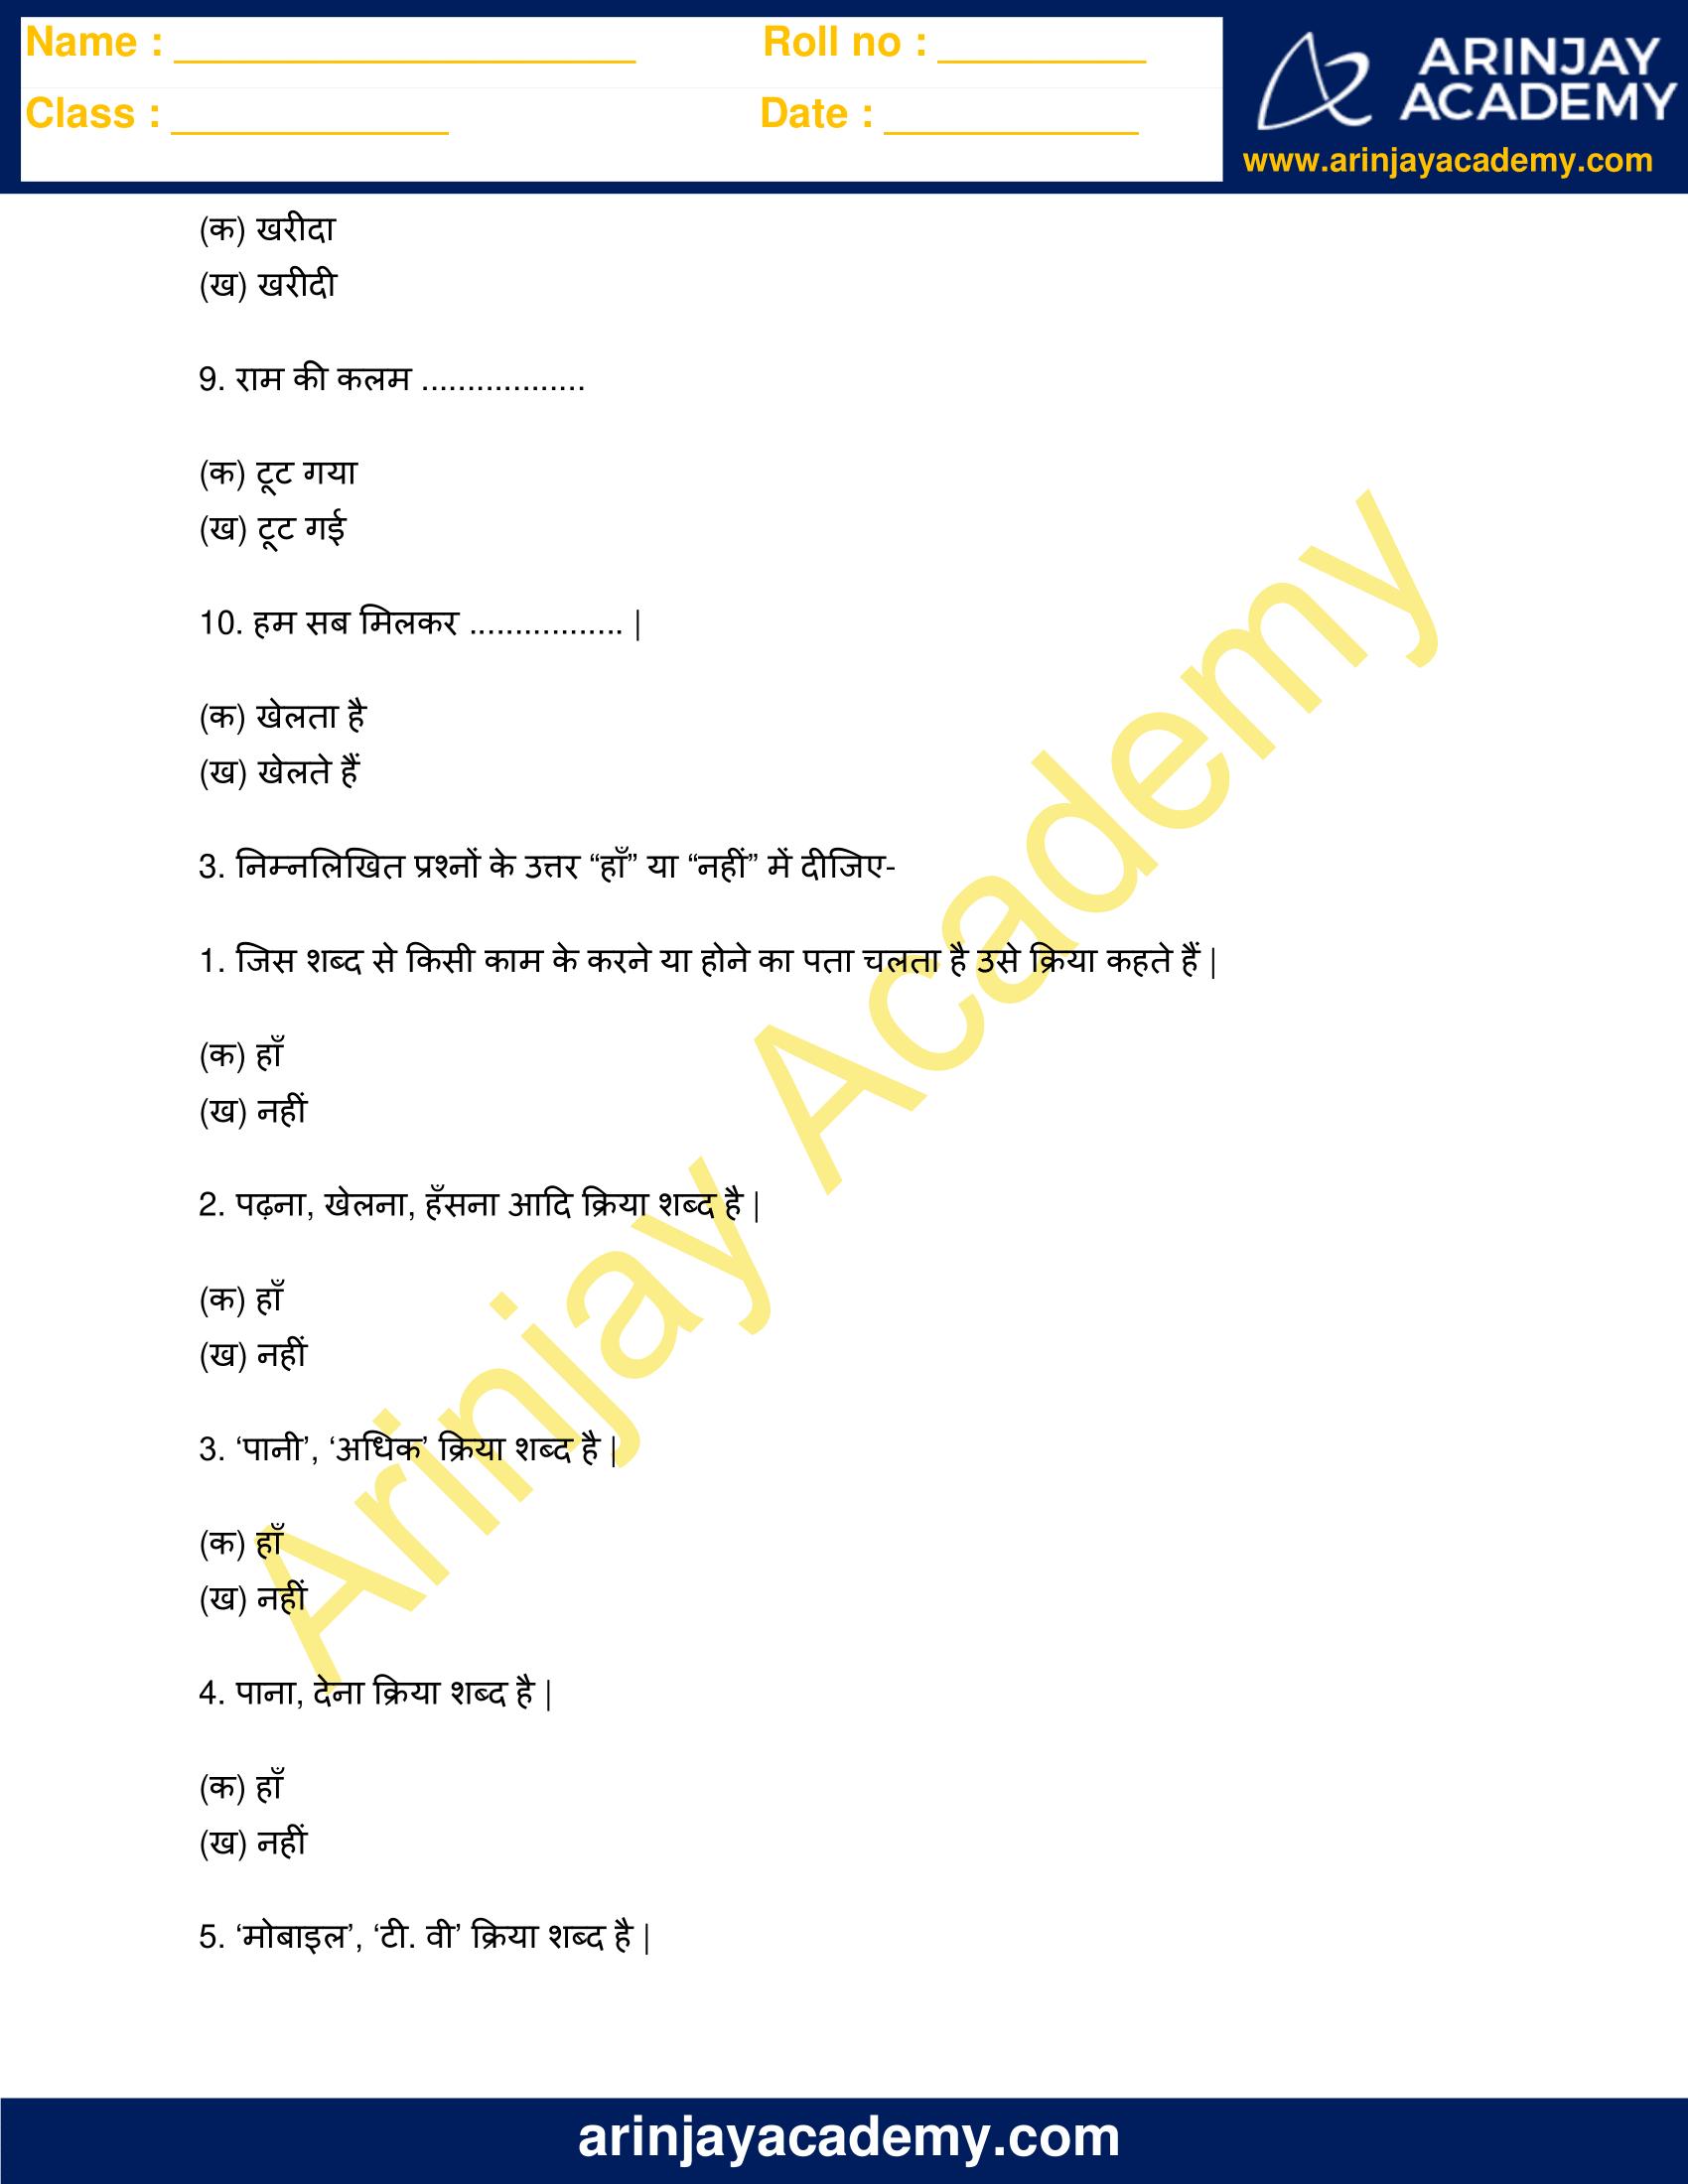 Kriya Worksheet for Class 3 image 4